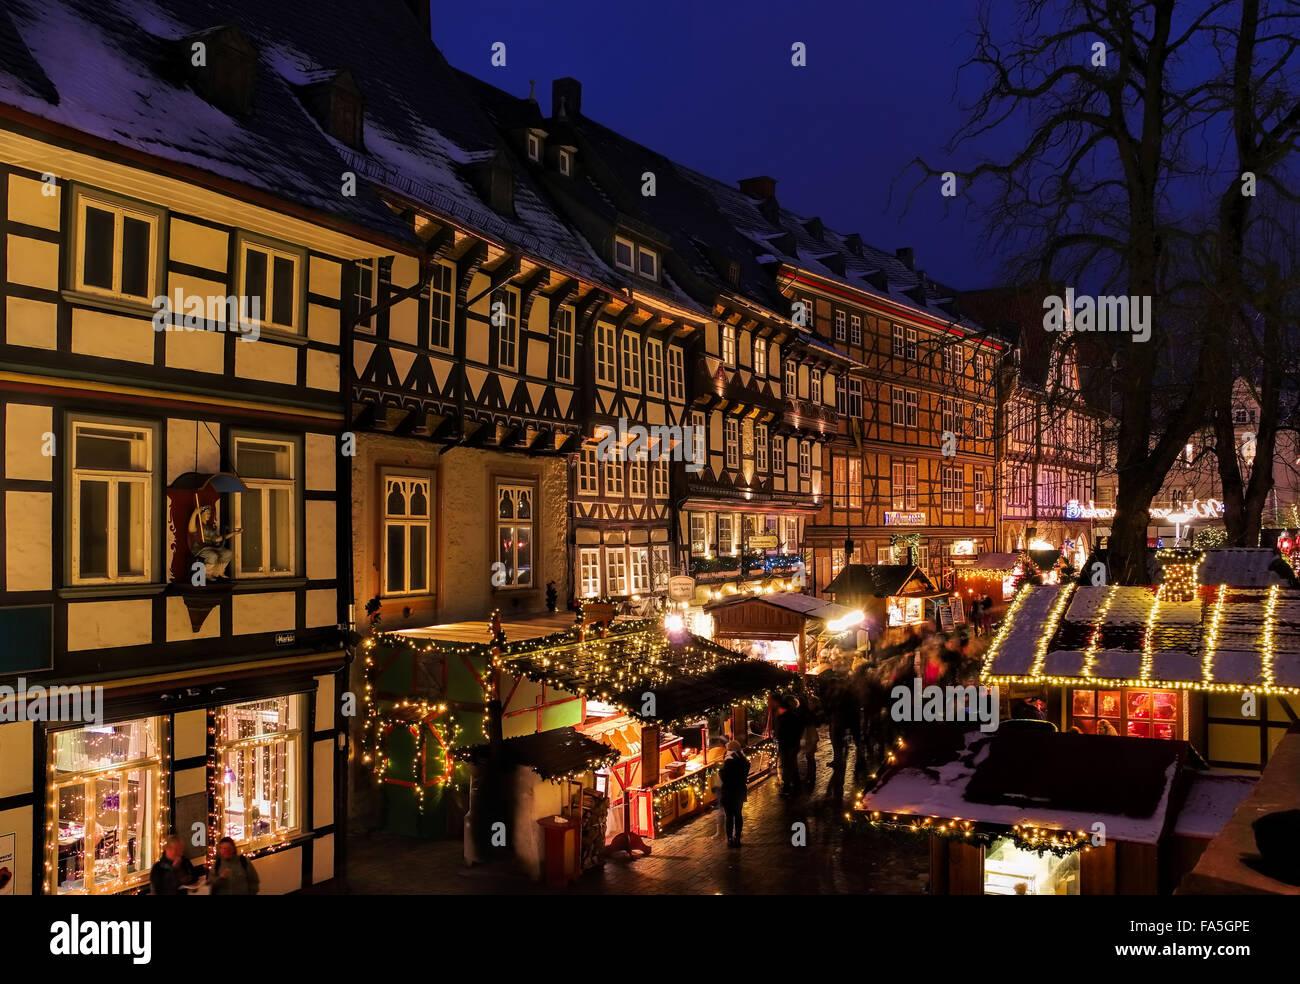 Goslar Weihnachtsmarkt.Goslar Weihnachtsmarkt Goslar Christmas Market 02 Stock